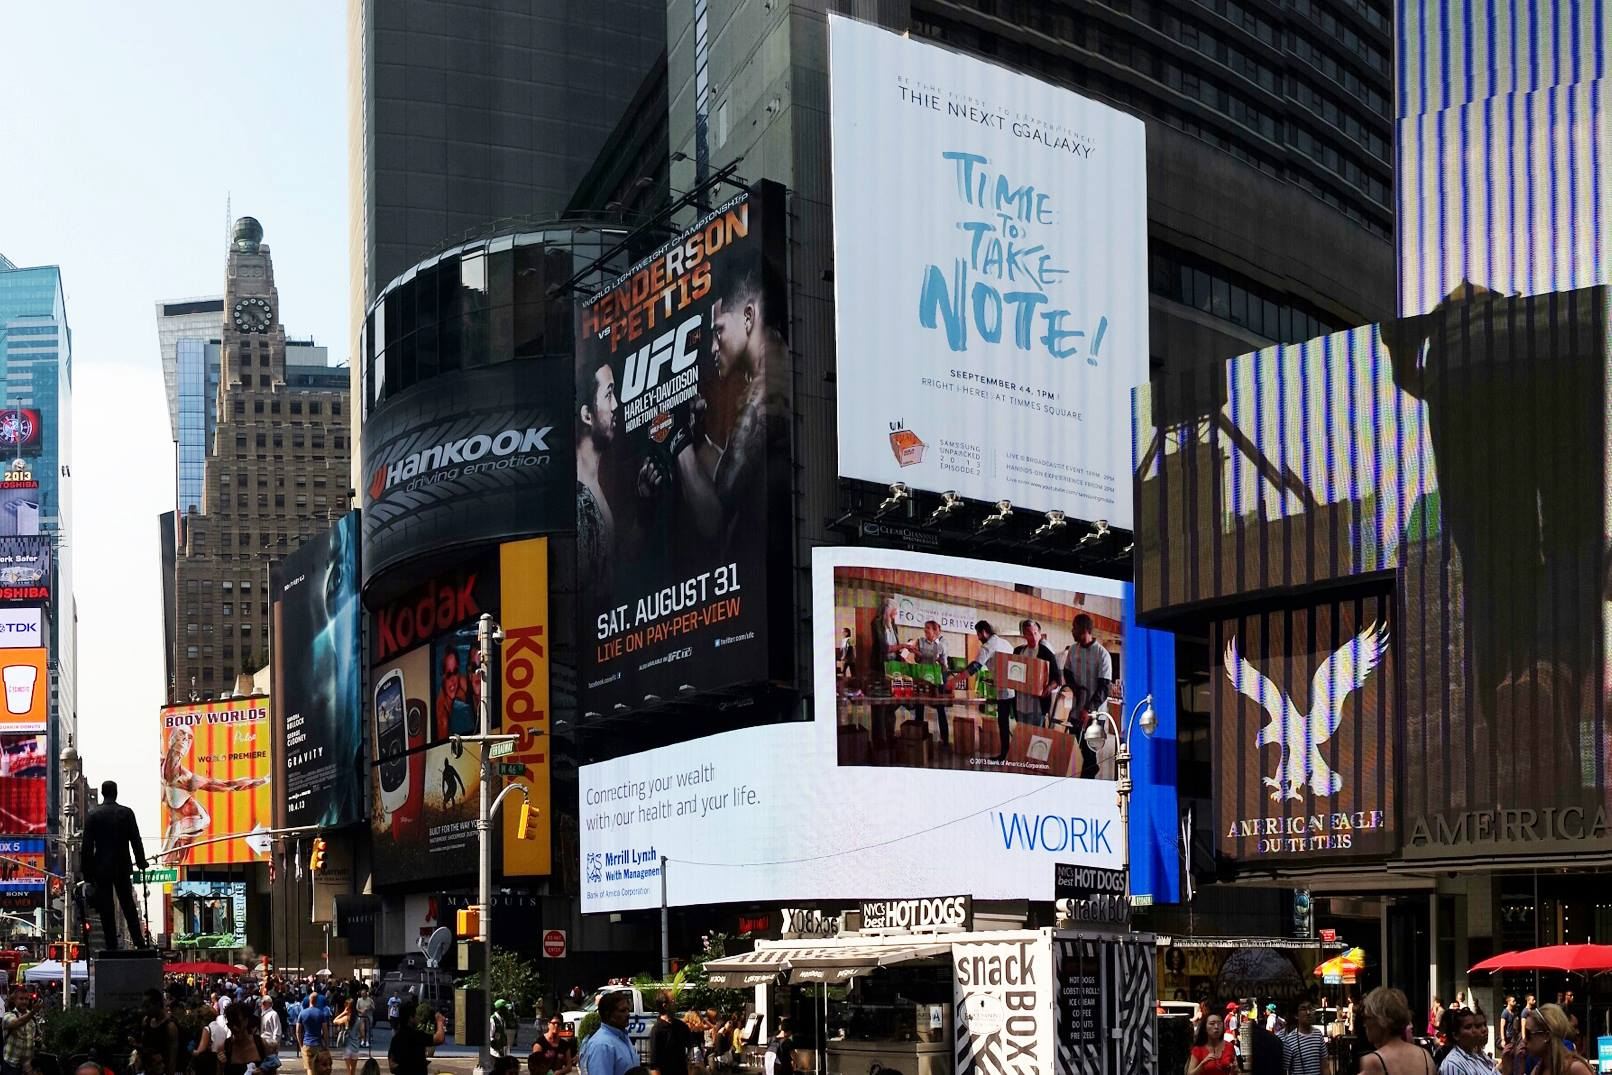 A billboard teasing the Galaxy Note 3 in 2013.